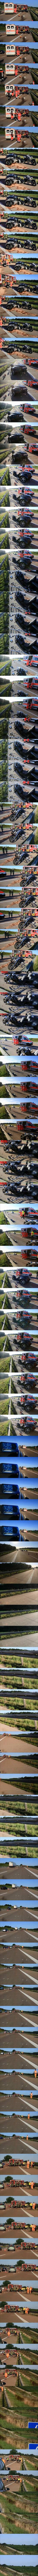 Tödlicher Unfall Trike - dpa audio & video service